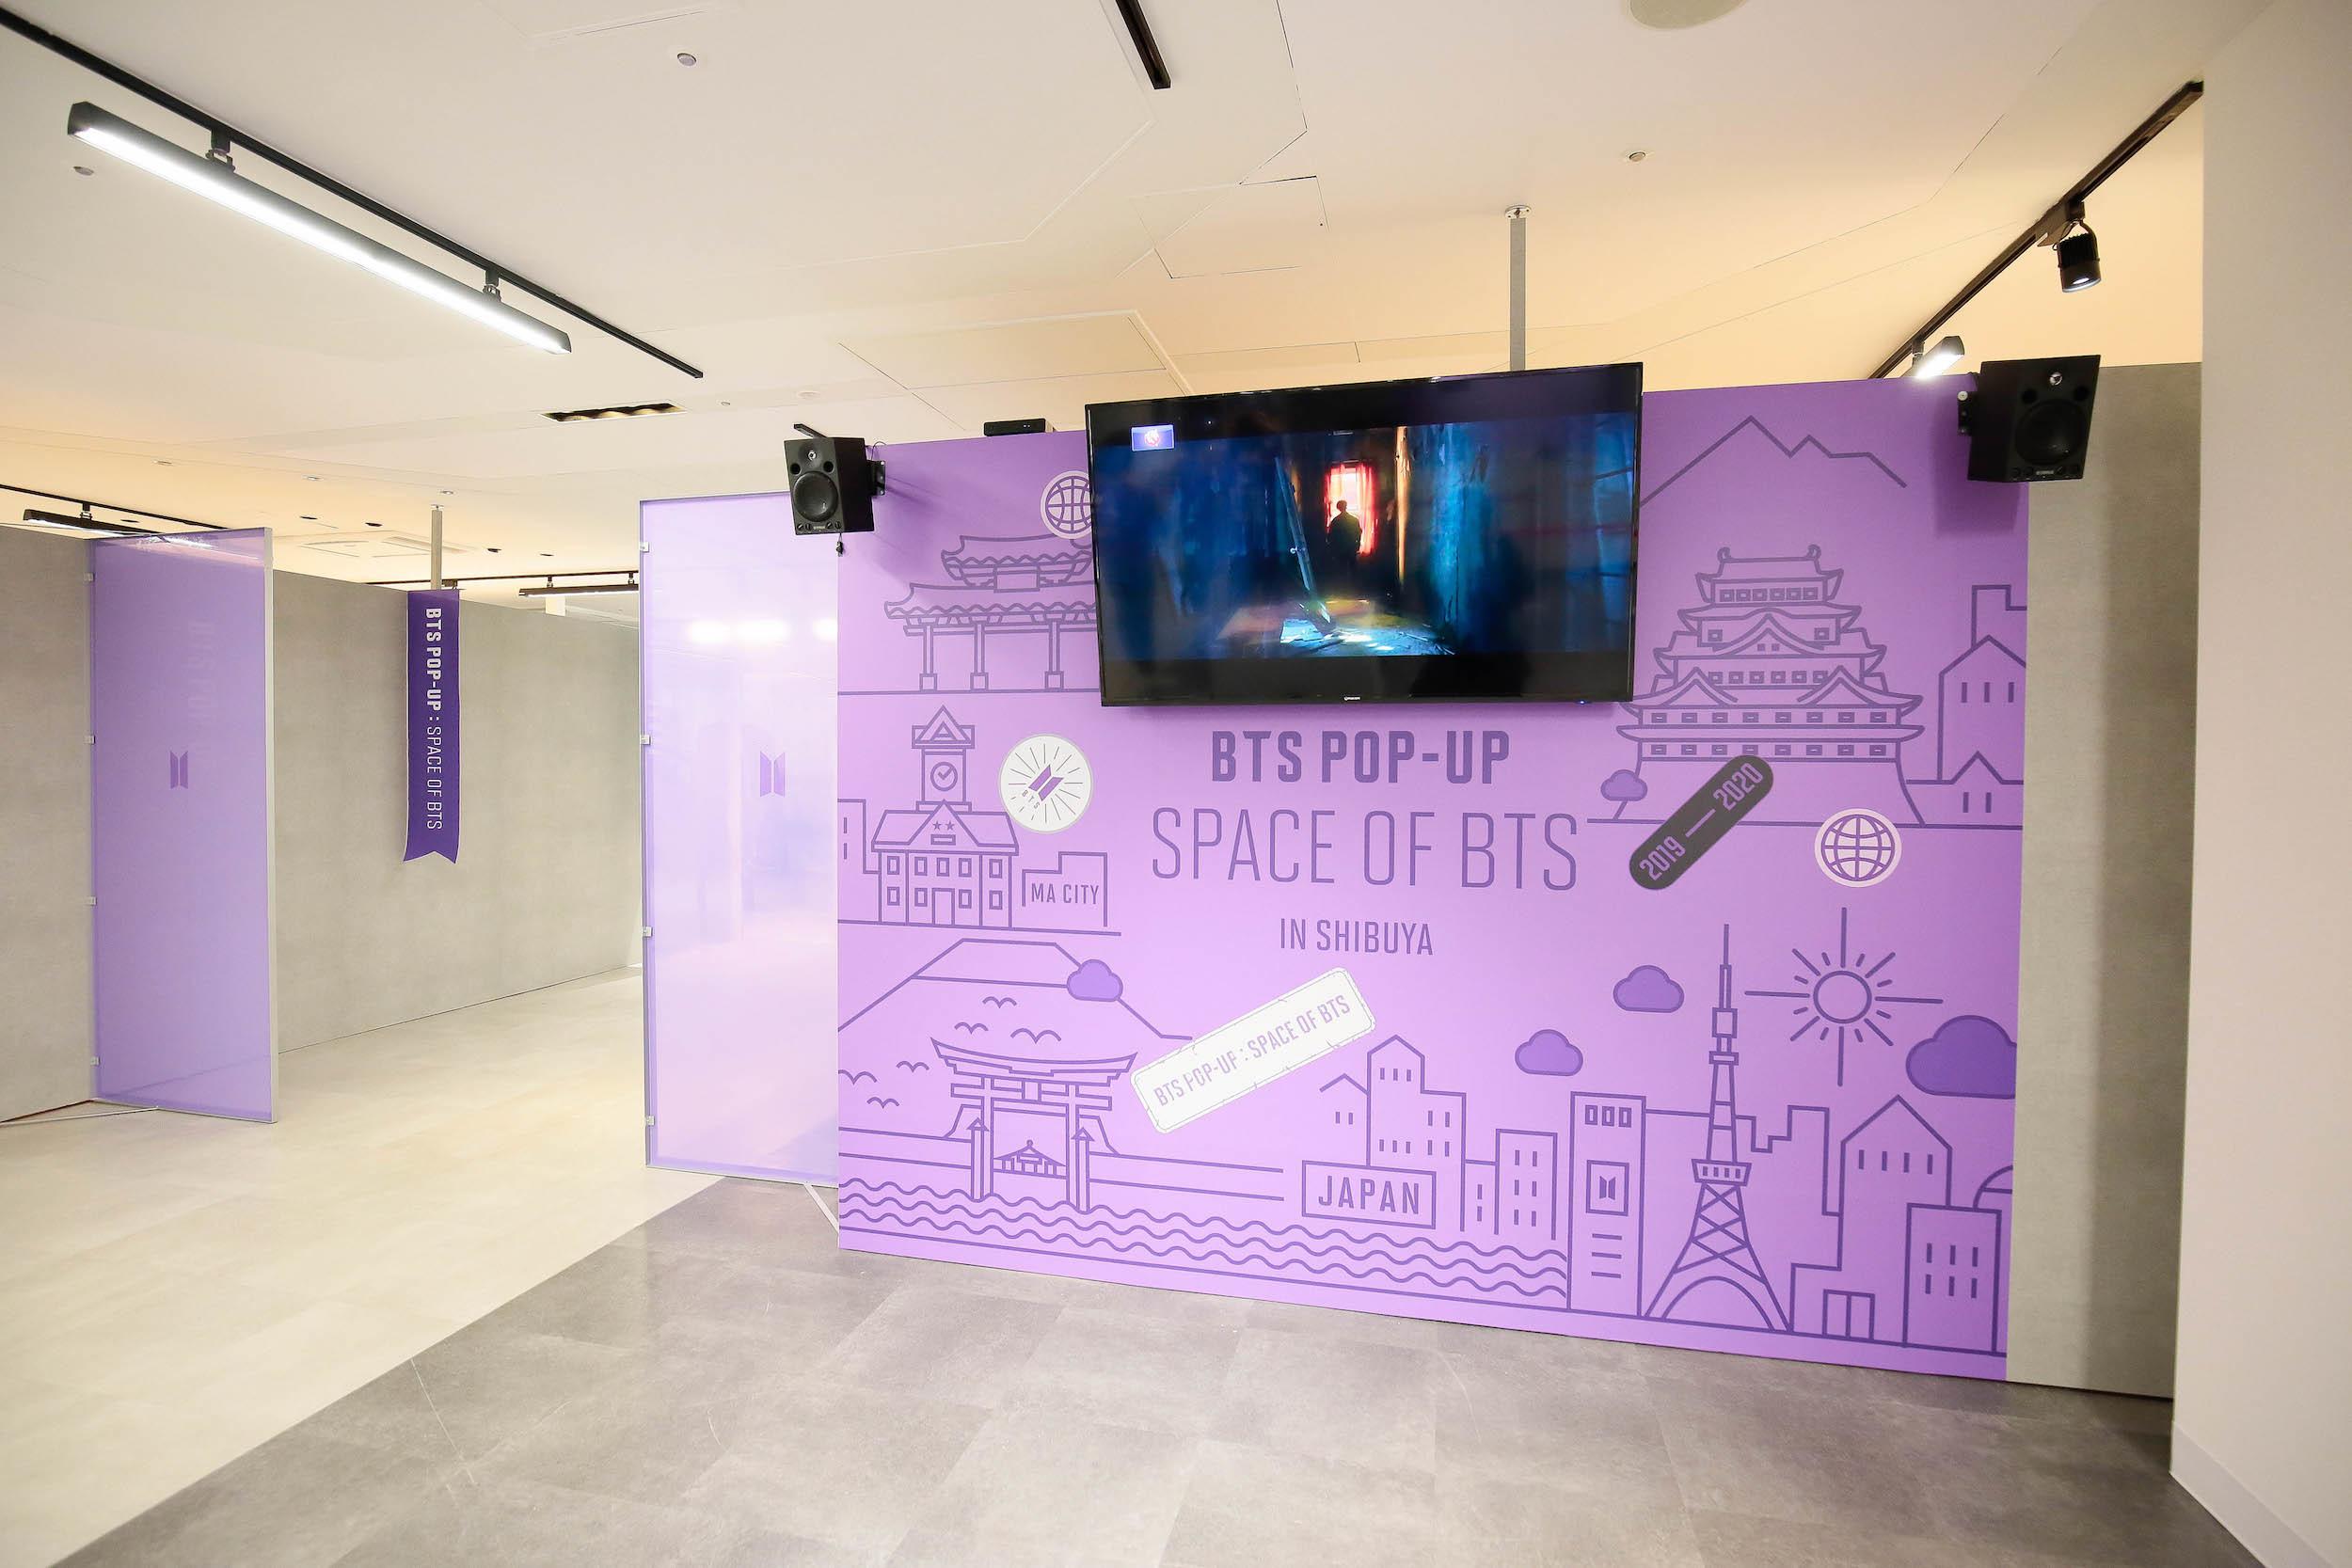 BTS POP-UP : SPACE OF BTS